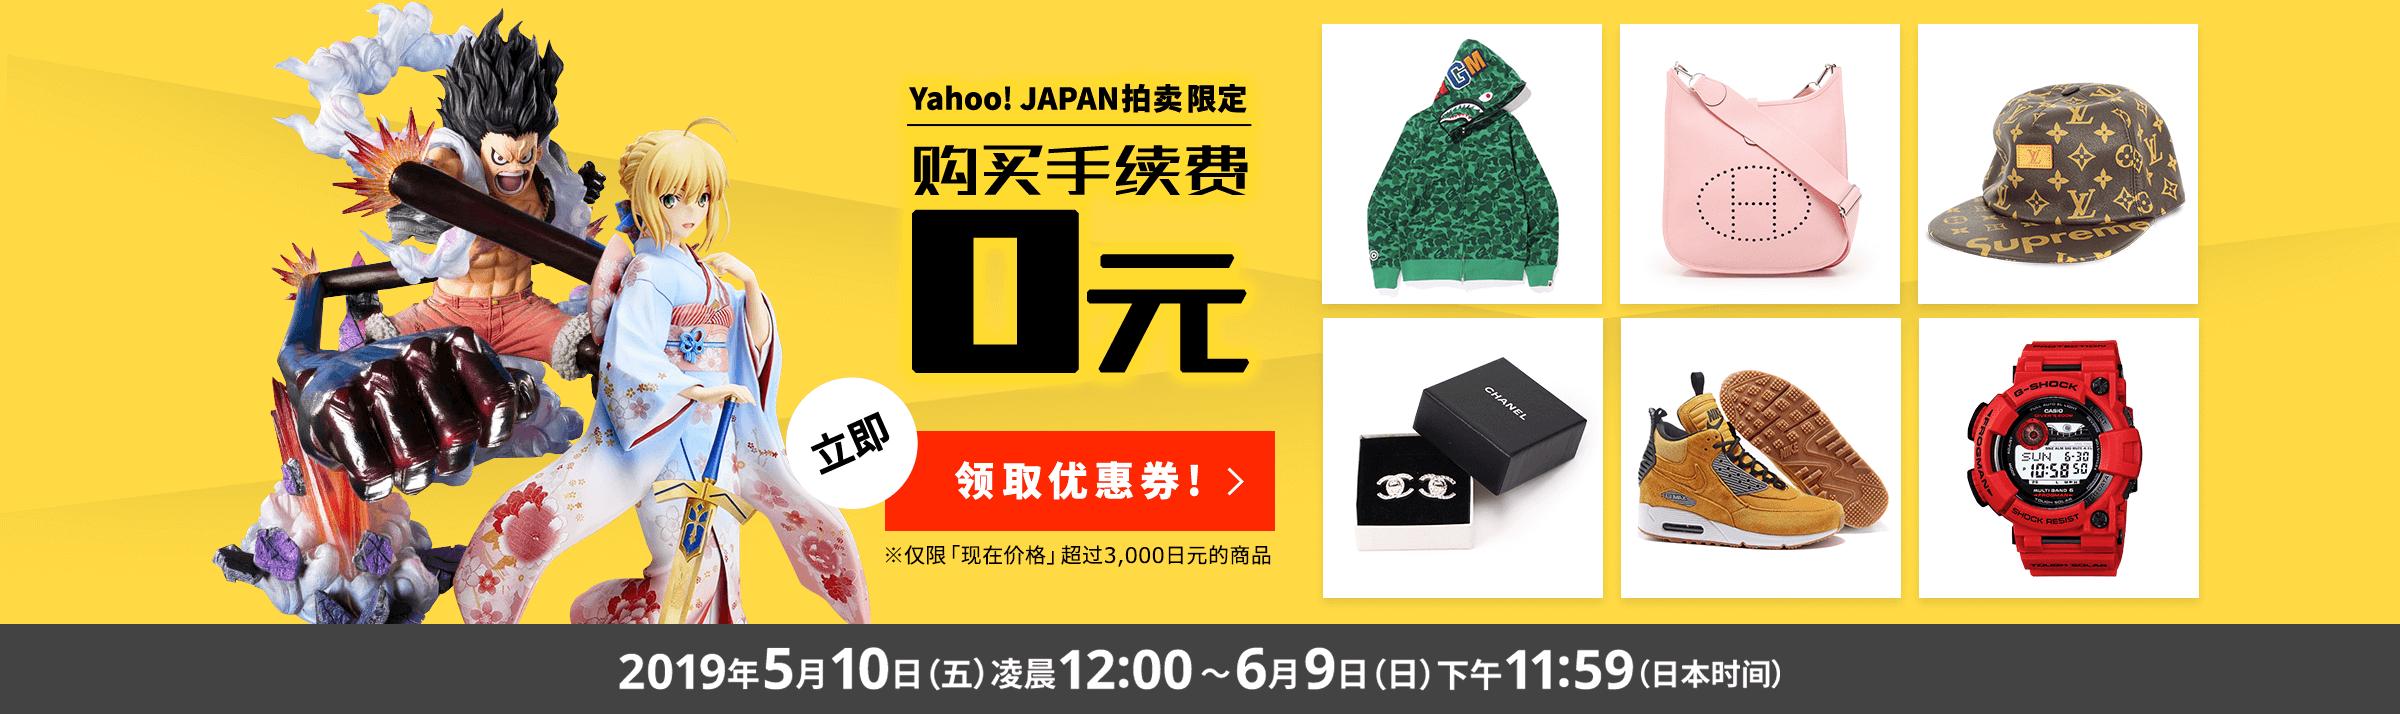 20190510 Yahoo! JAPAN拍卖限定 购买手续费「免费」优惠券